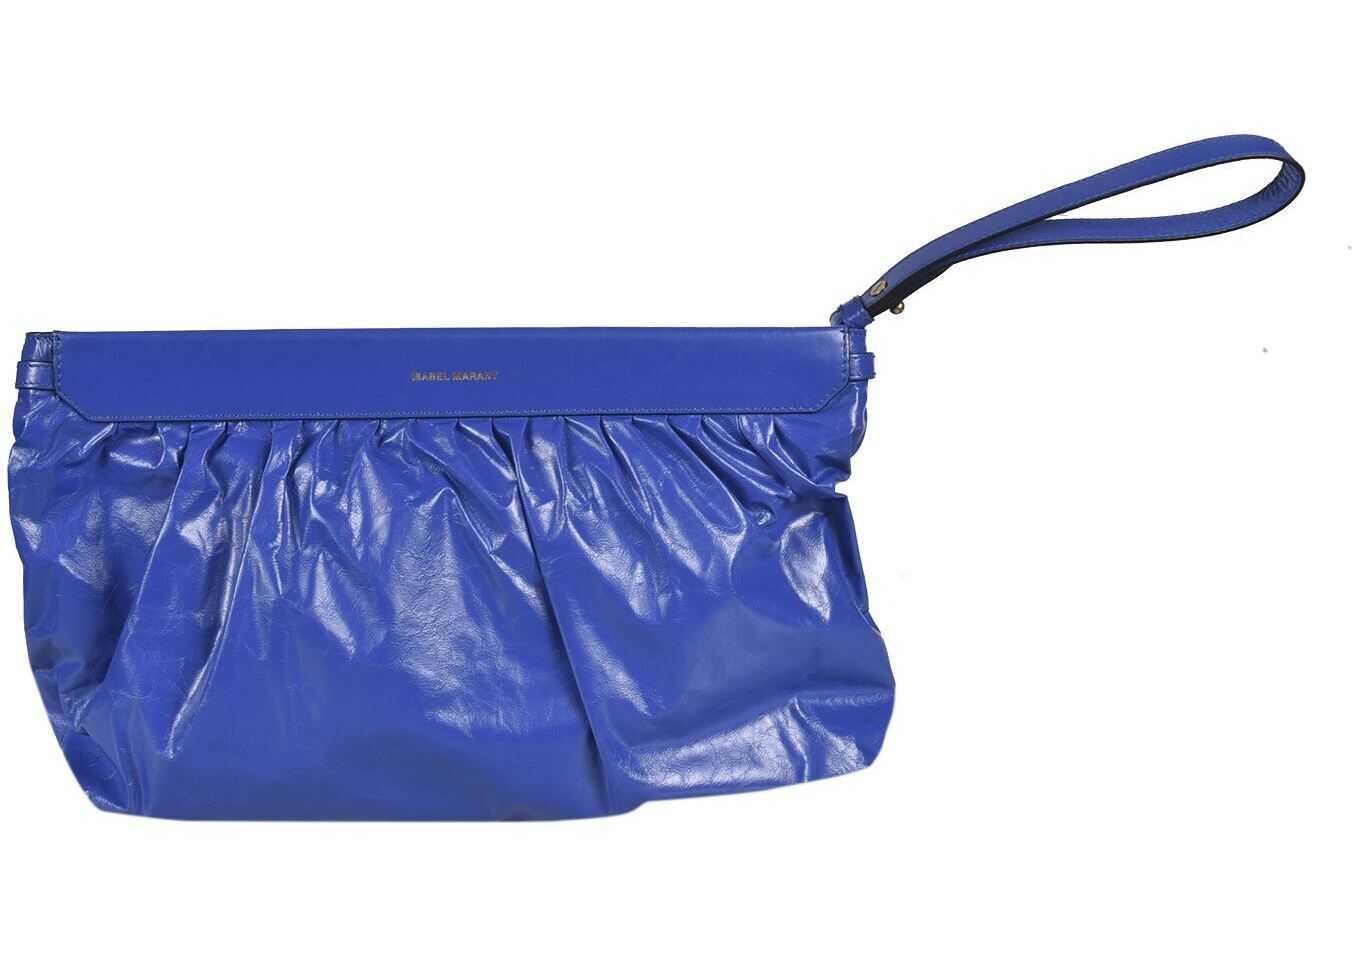 Isabel Marant Luz Clutch Bag In Blue PO011821E052MBLUE Blue imagine b-mall.ro